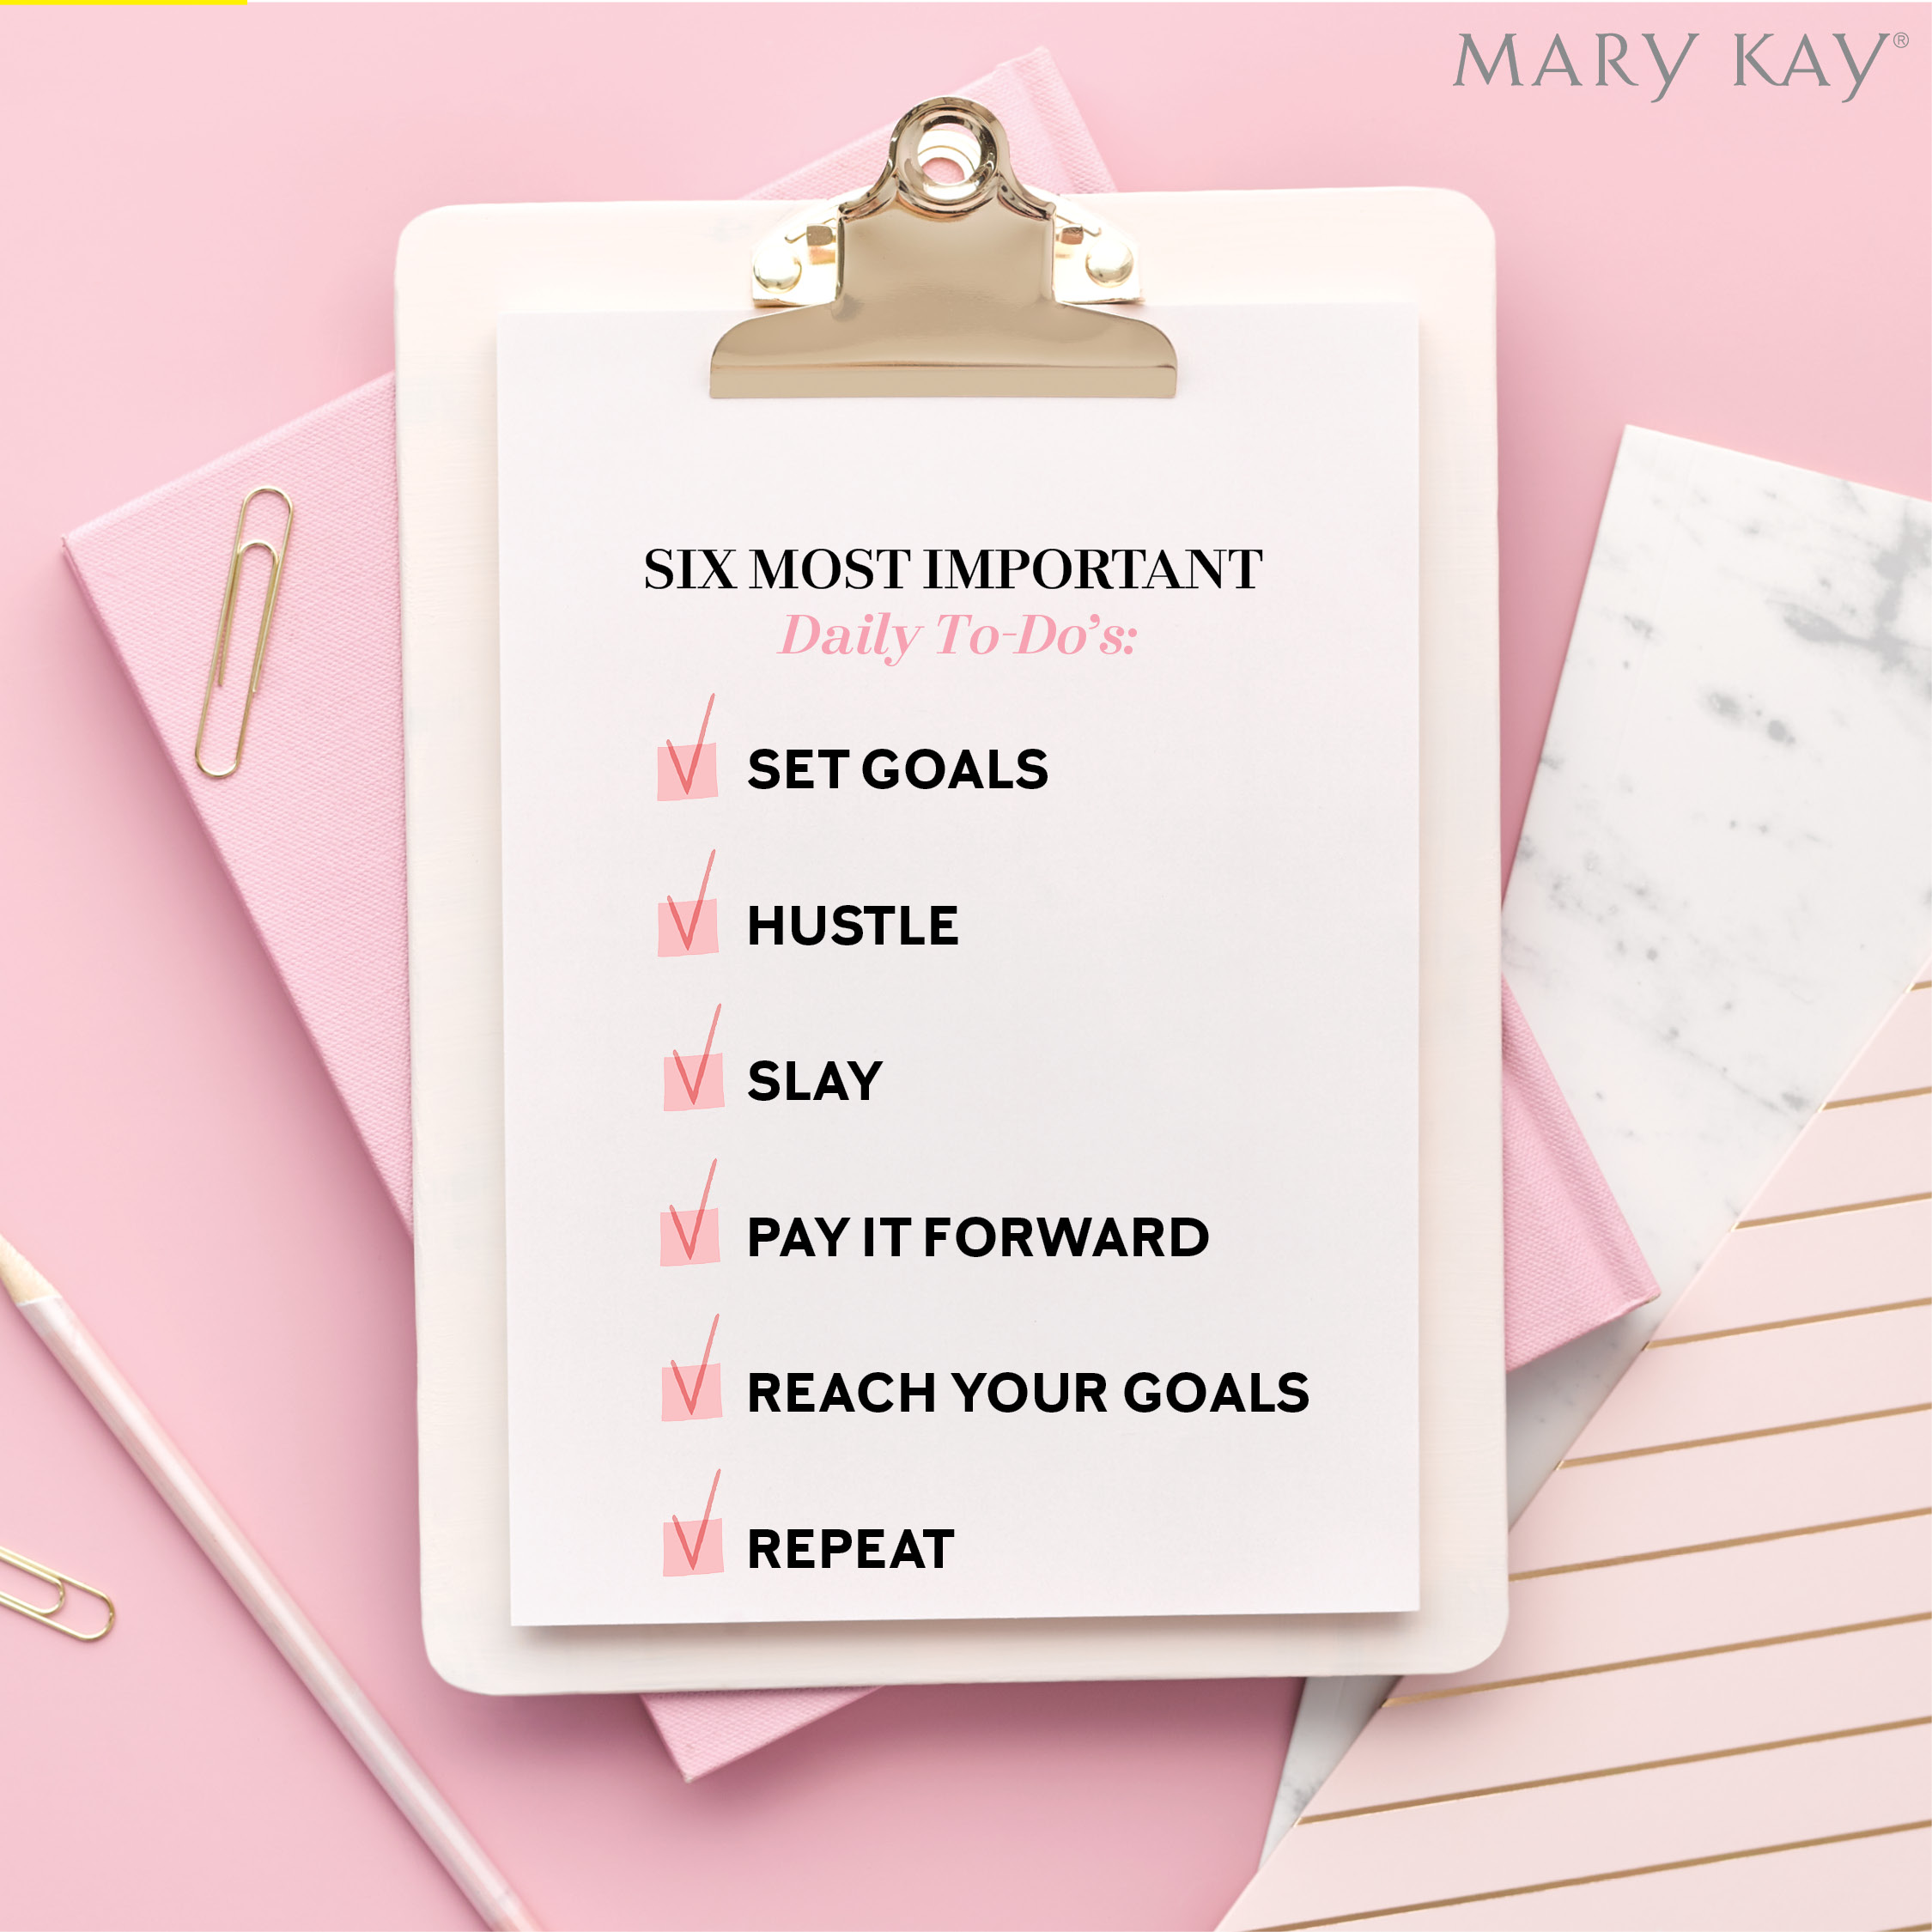 771310-GP-Womens-Entrepreneurship-Day-SM-Posts11.jpg